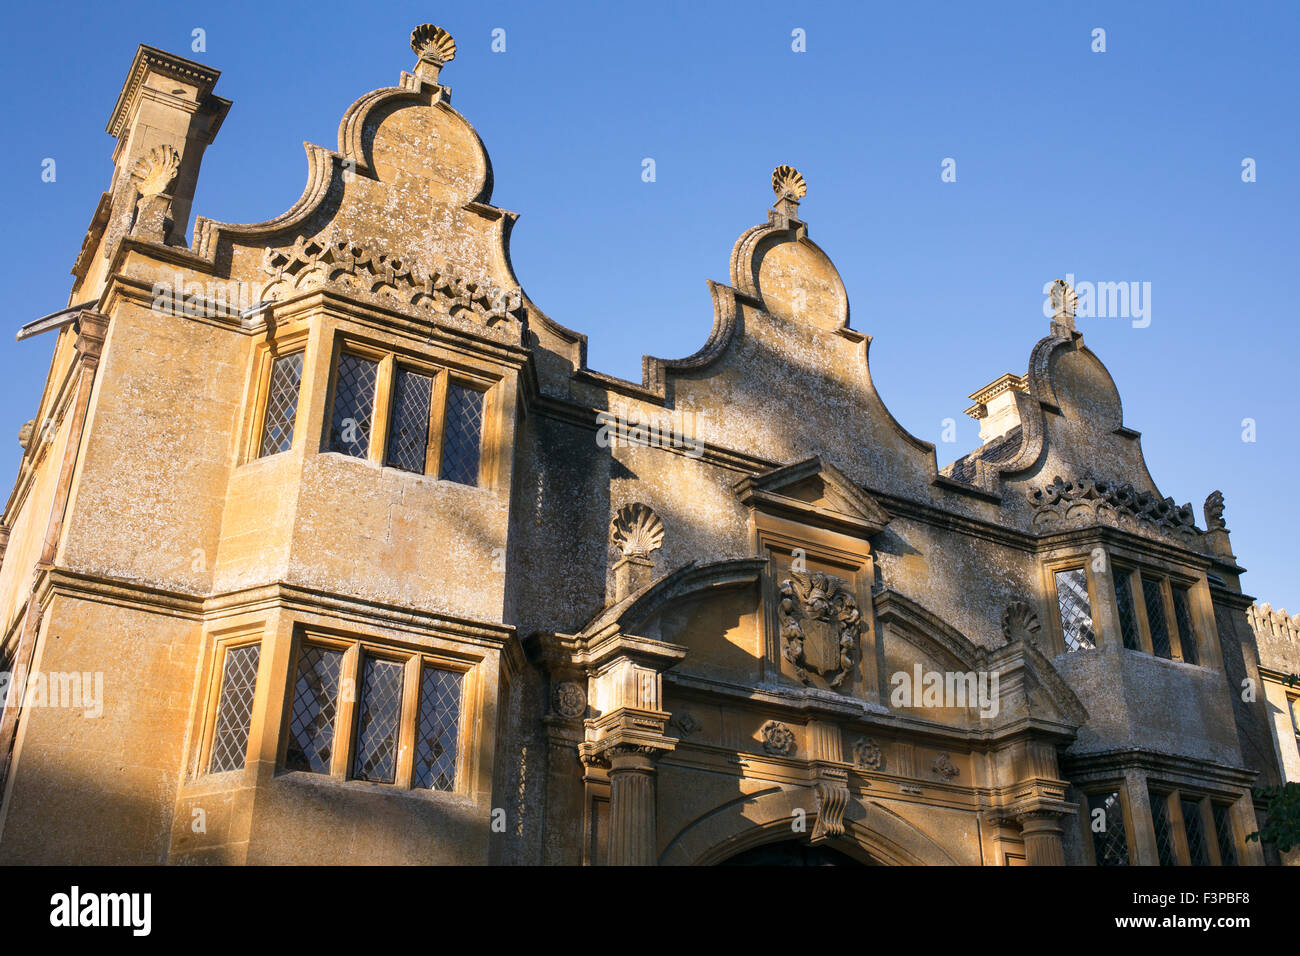 Stanway house gatehouse. Cotswolds, Gloucestershire, England Stock Photo